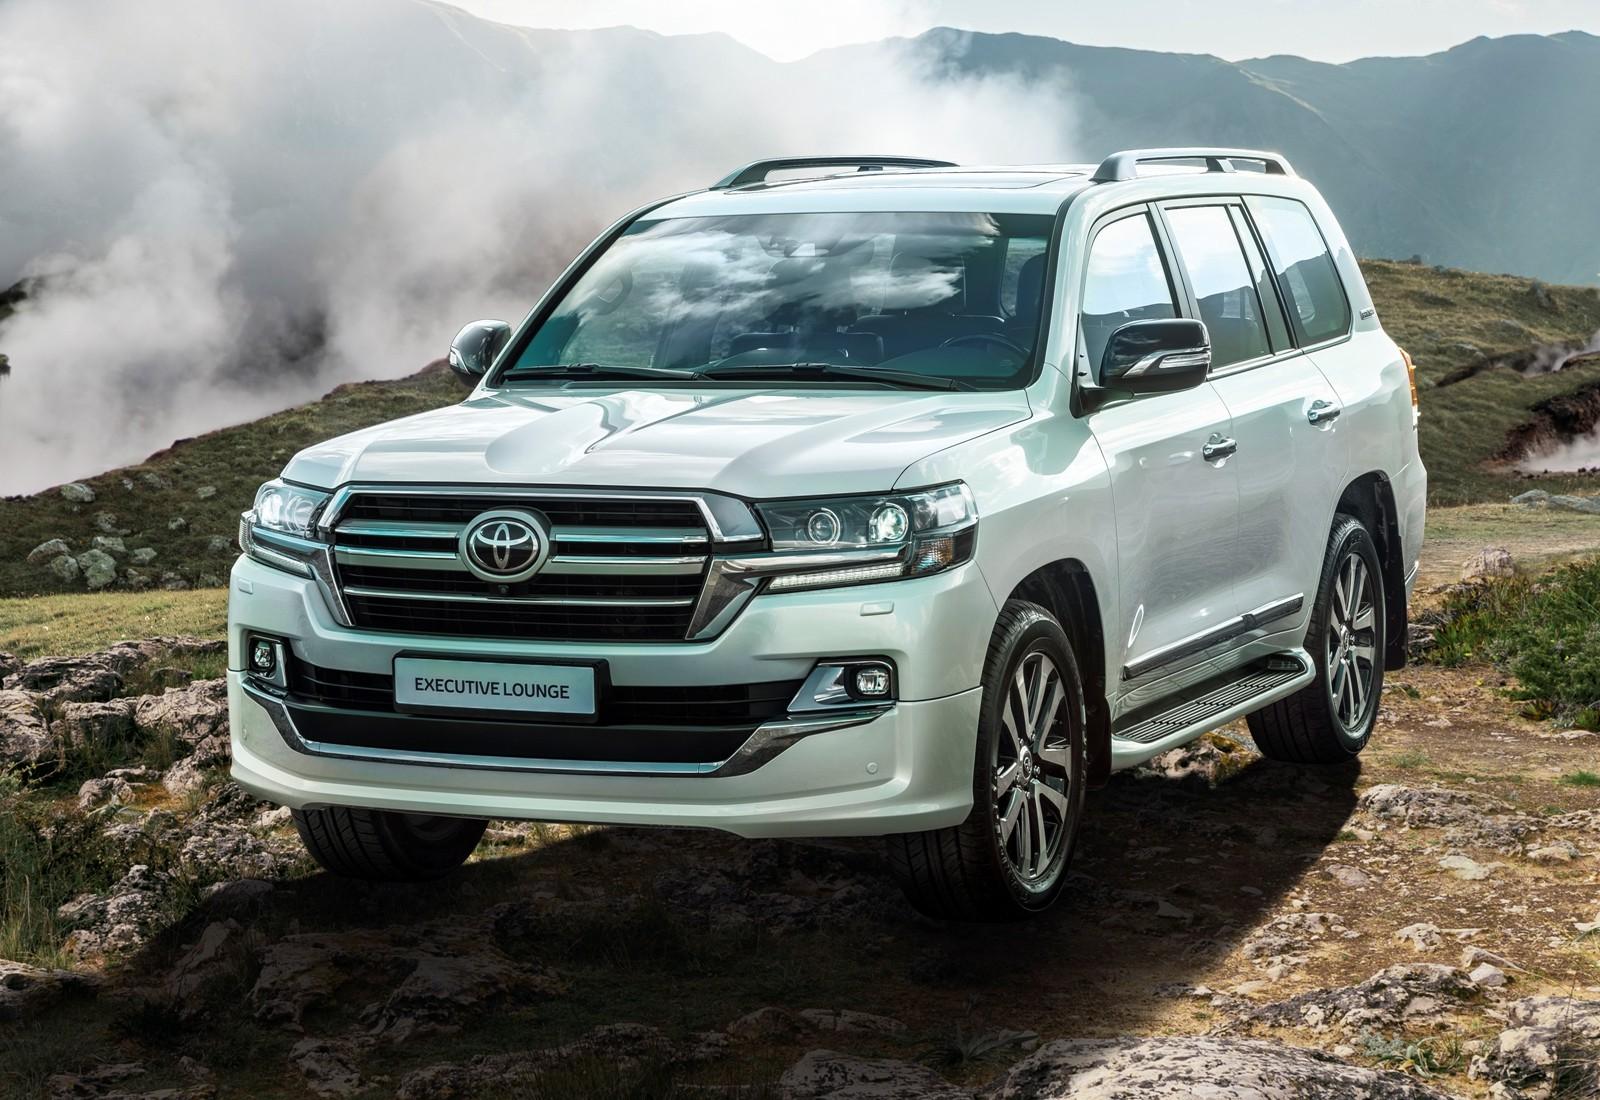 Toyota Land Cruiser 200 Executive Lounge_key visual